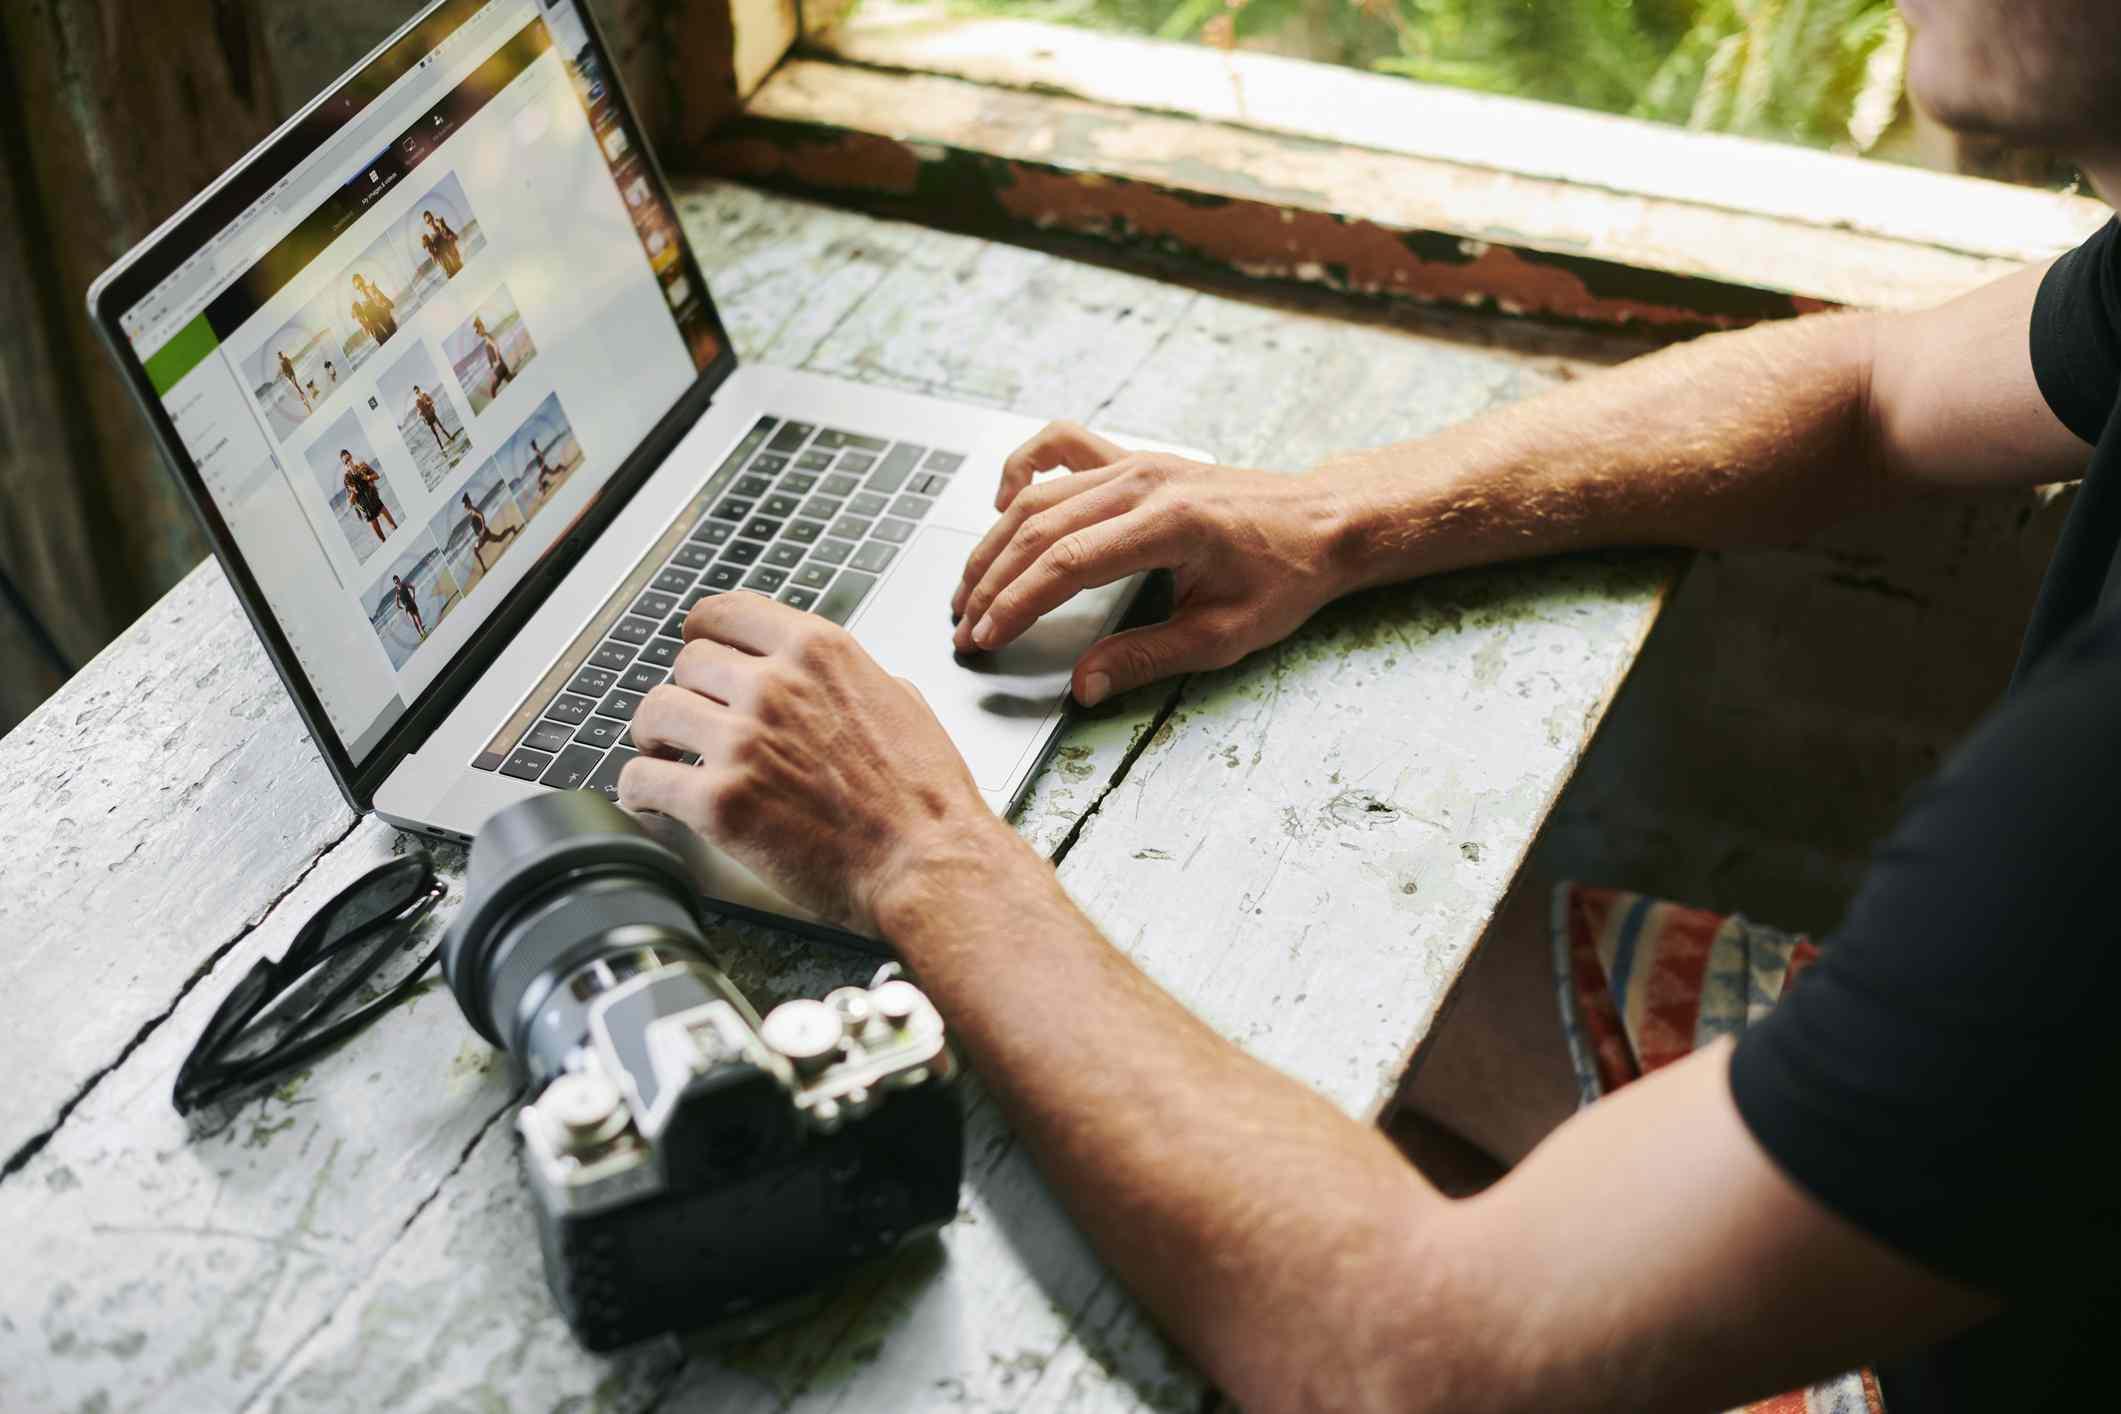 A photographer editing photos on a laptop.